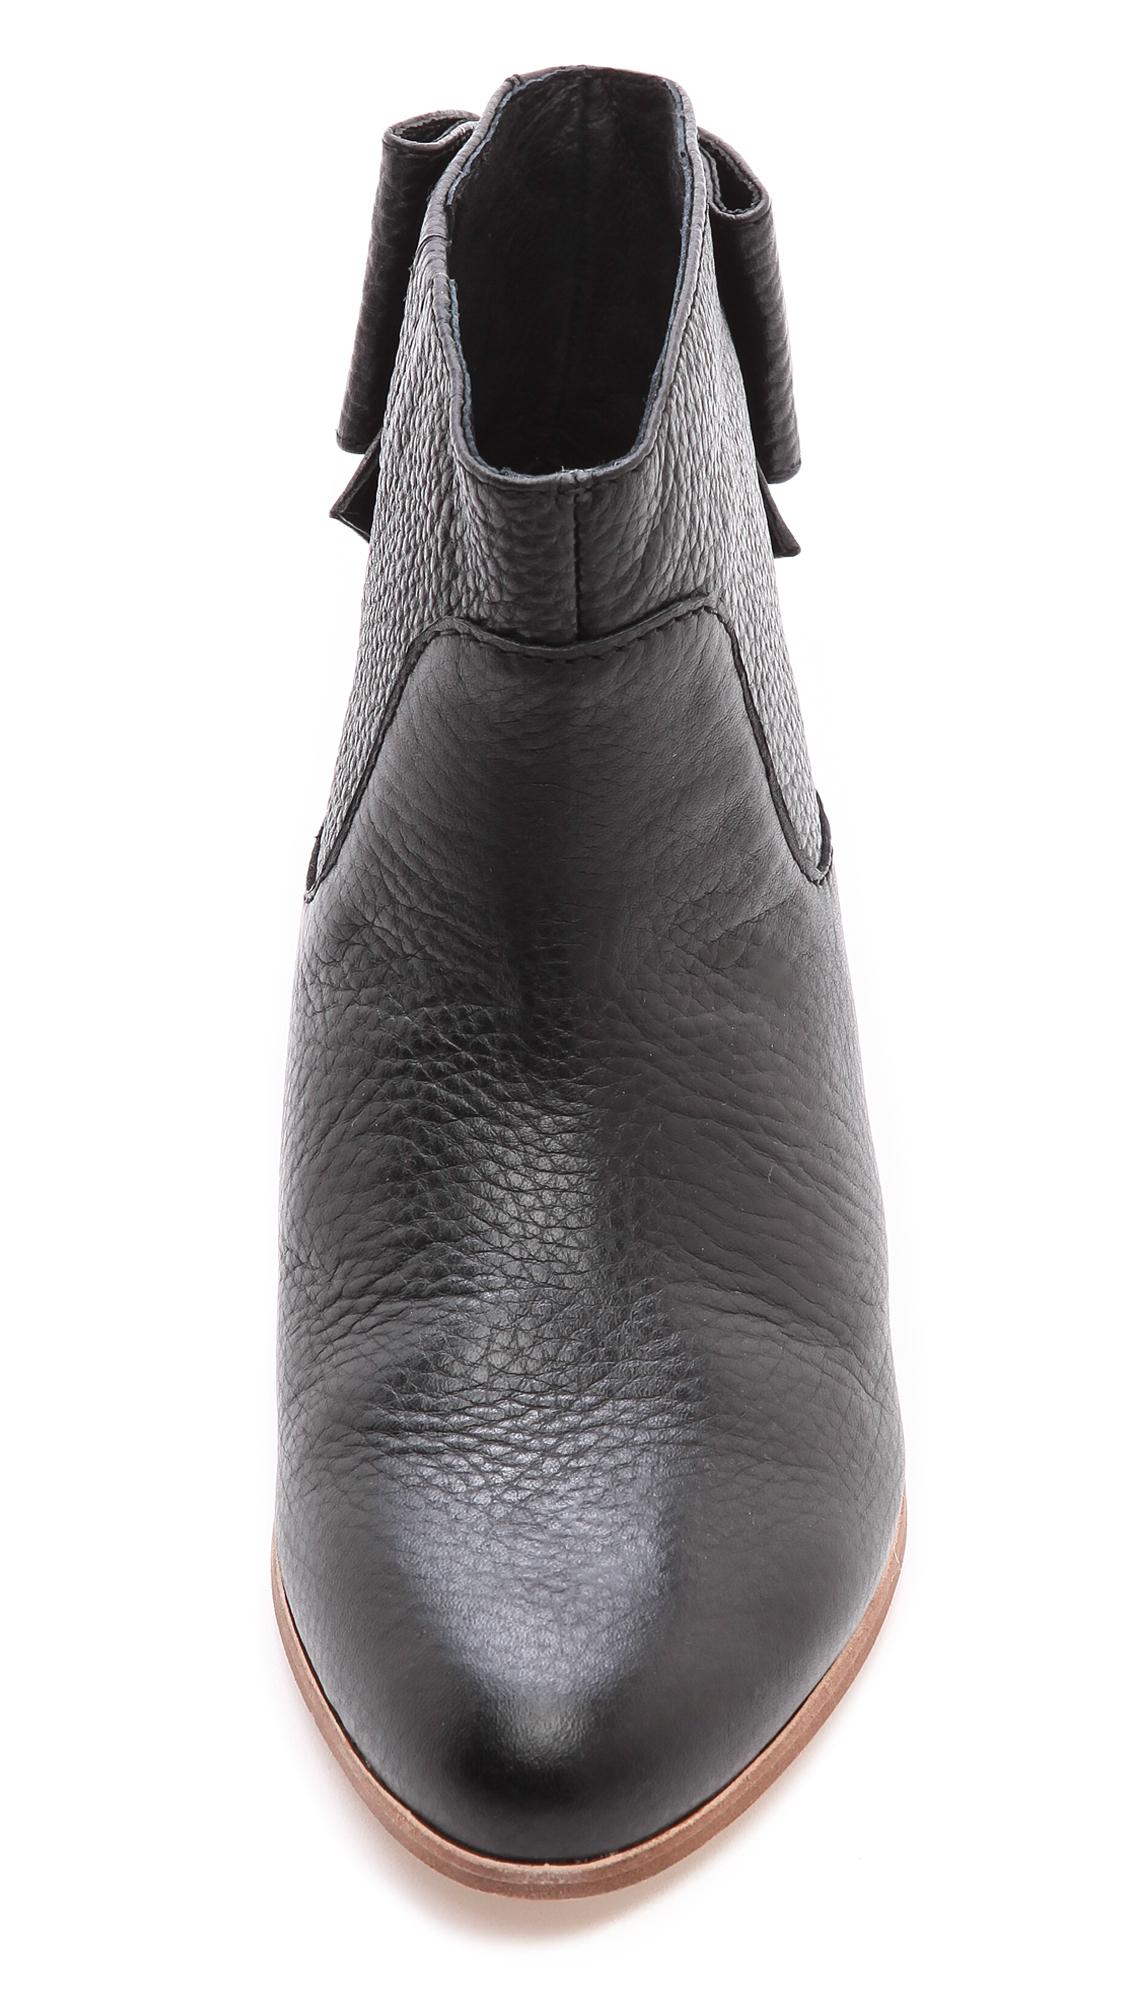 Kate Spade Prospect Flat Bow Booties - Black - Lyst-6358